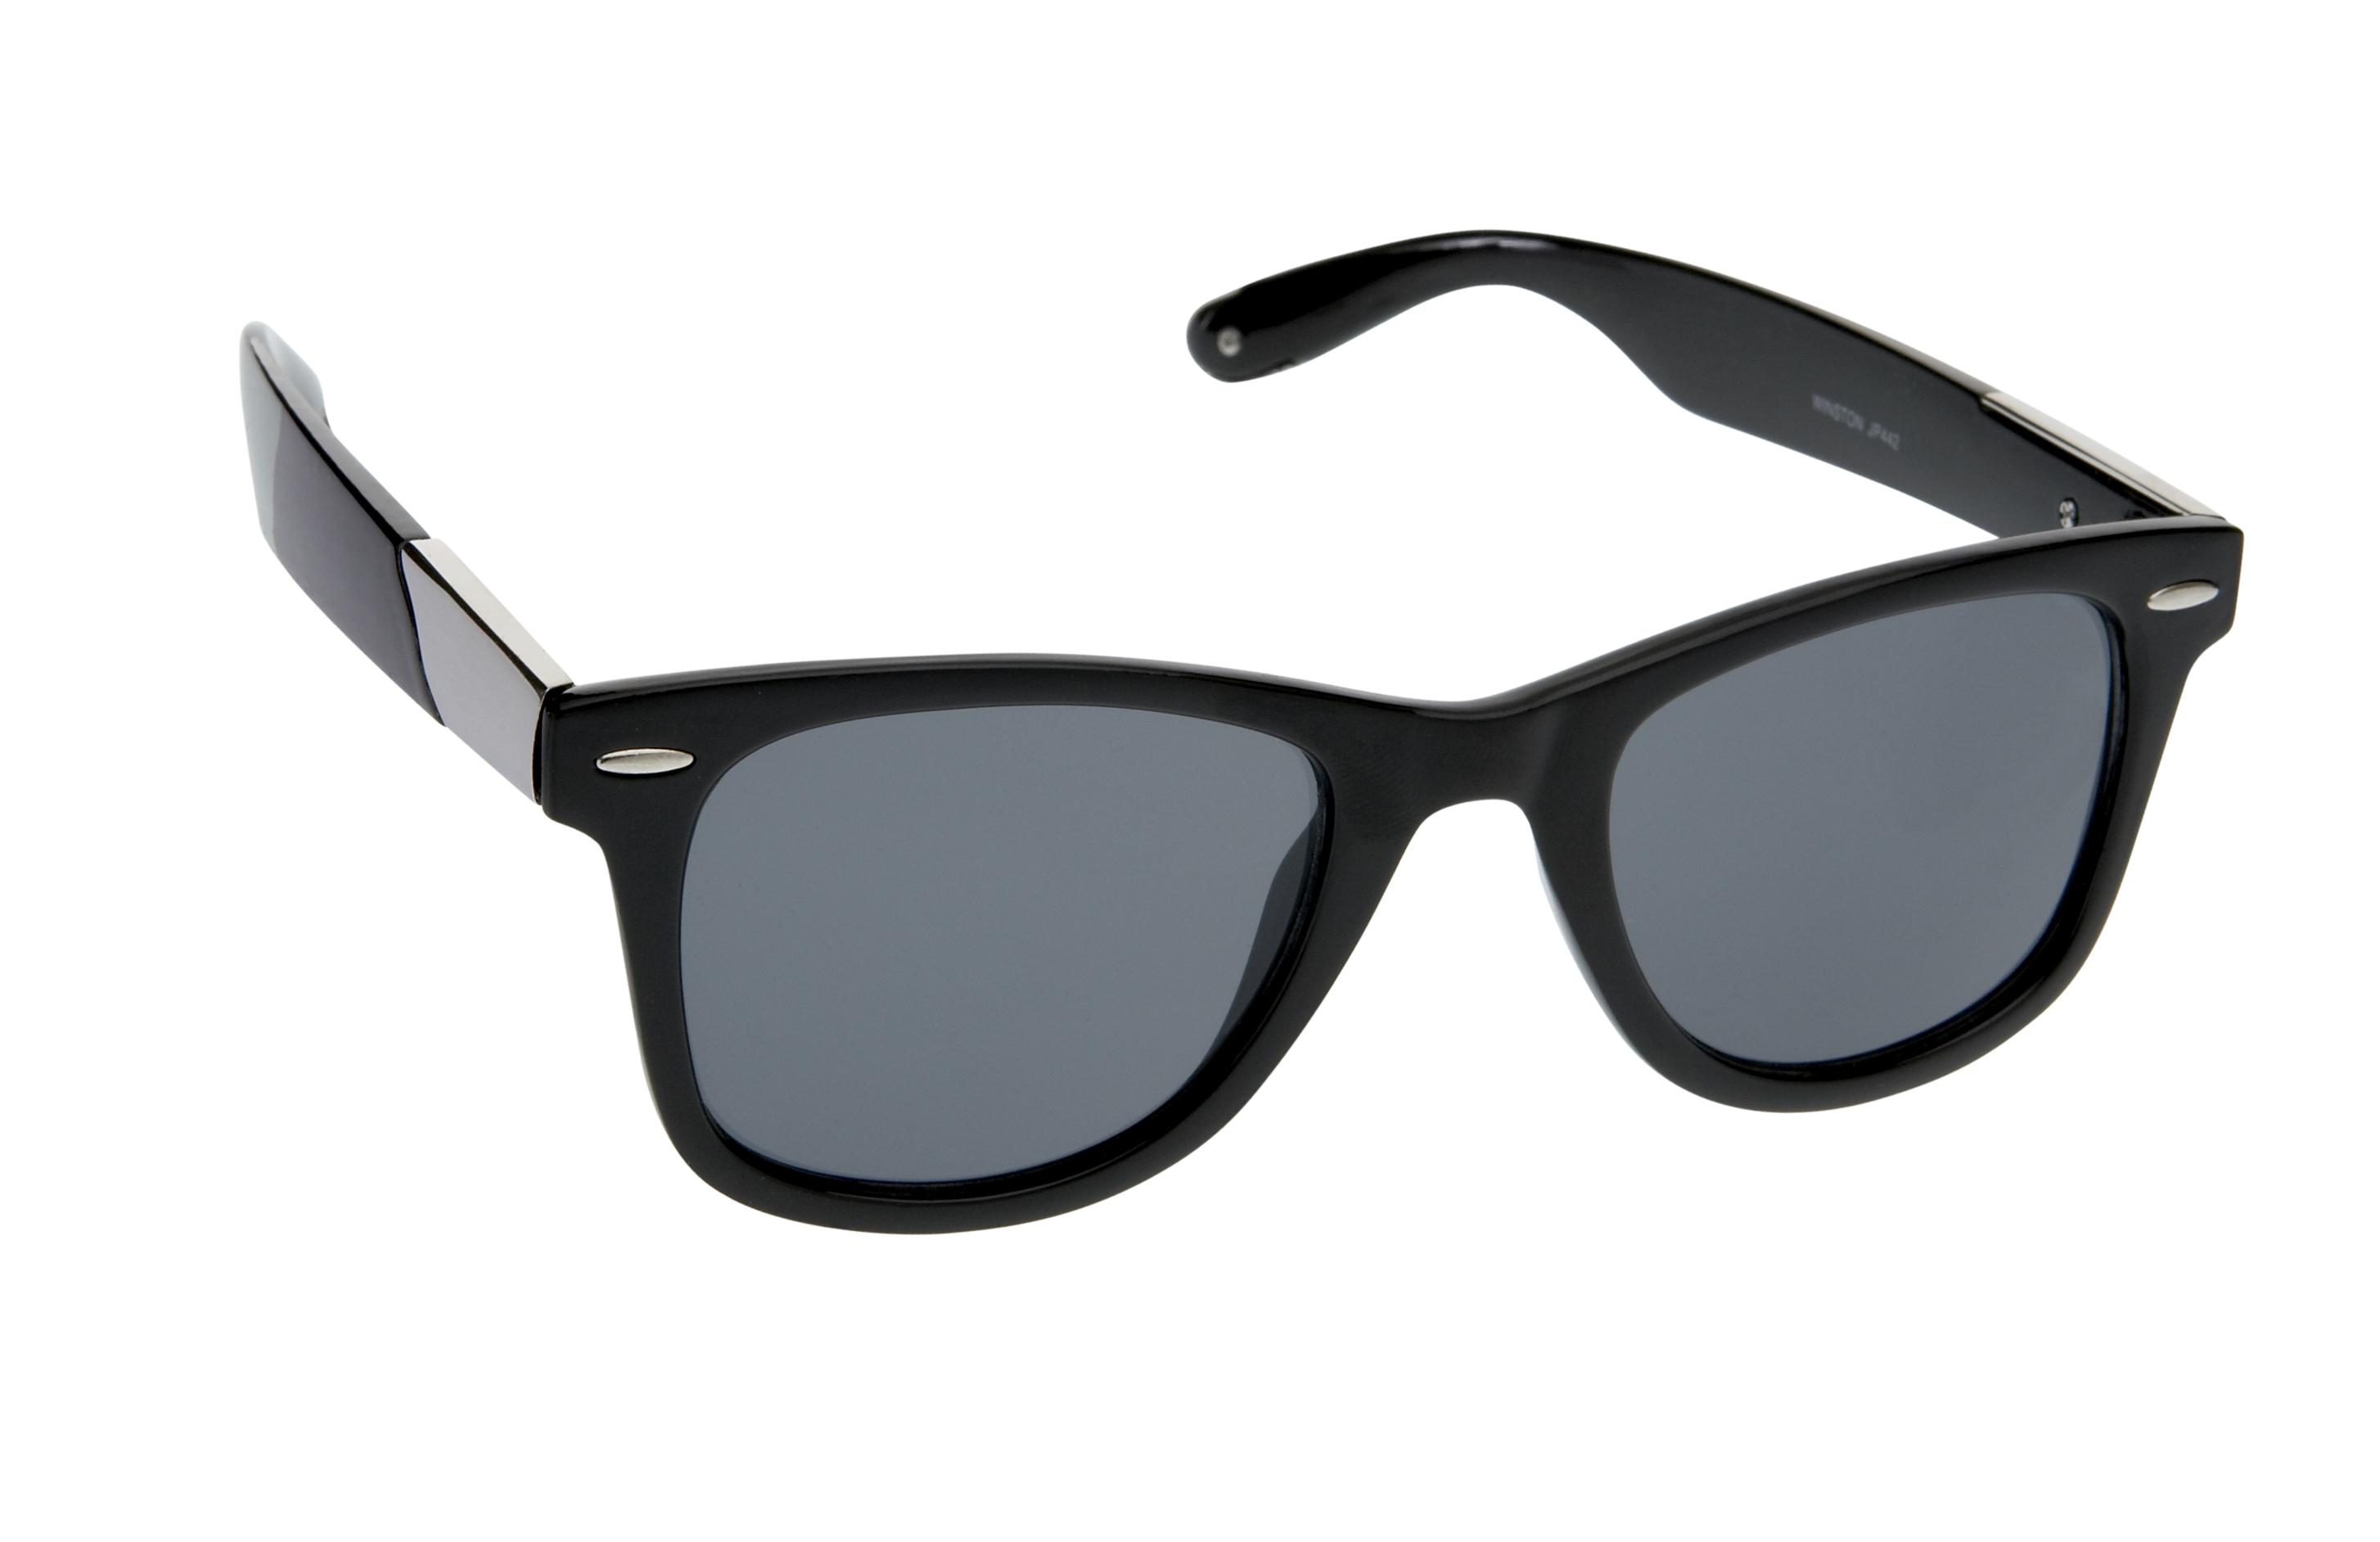 Black Winston Wayfarer Sunglasses From Jeepers Peepers